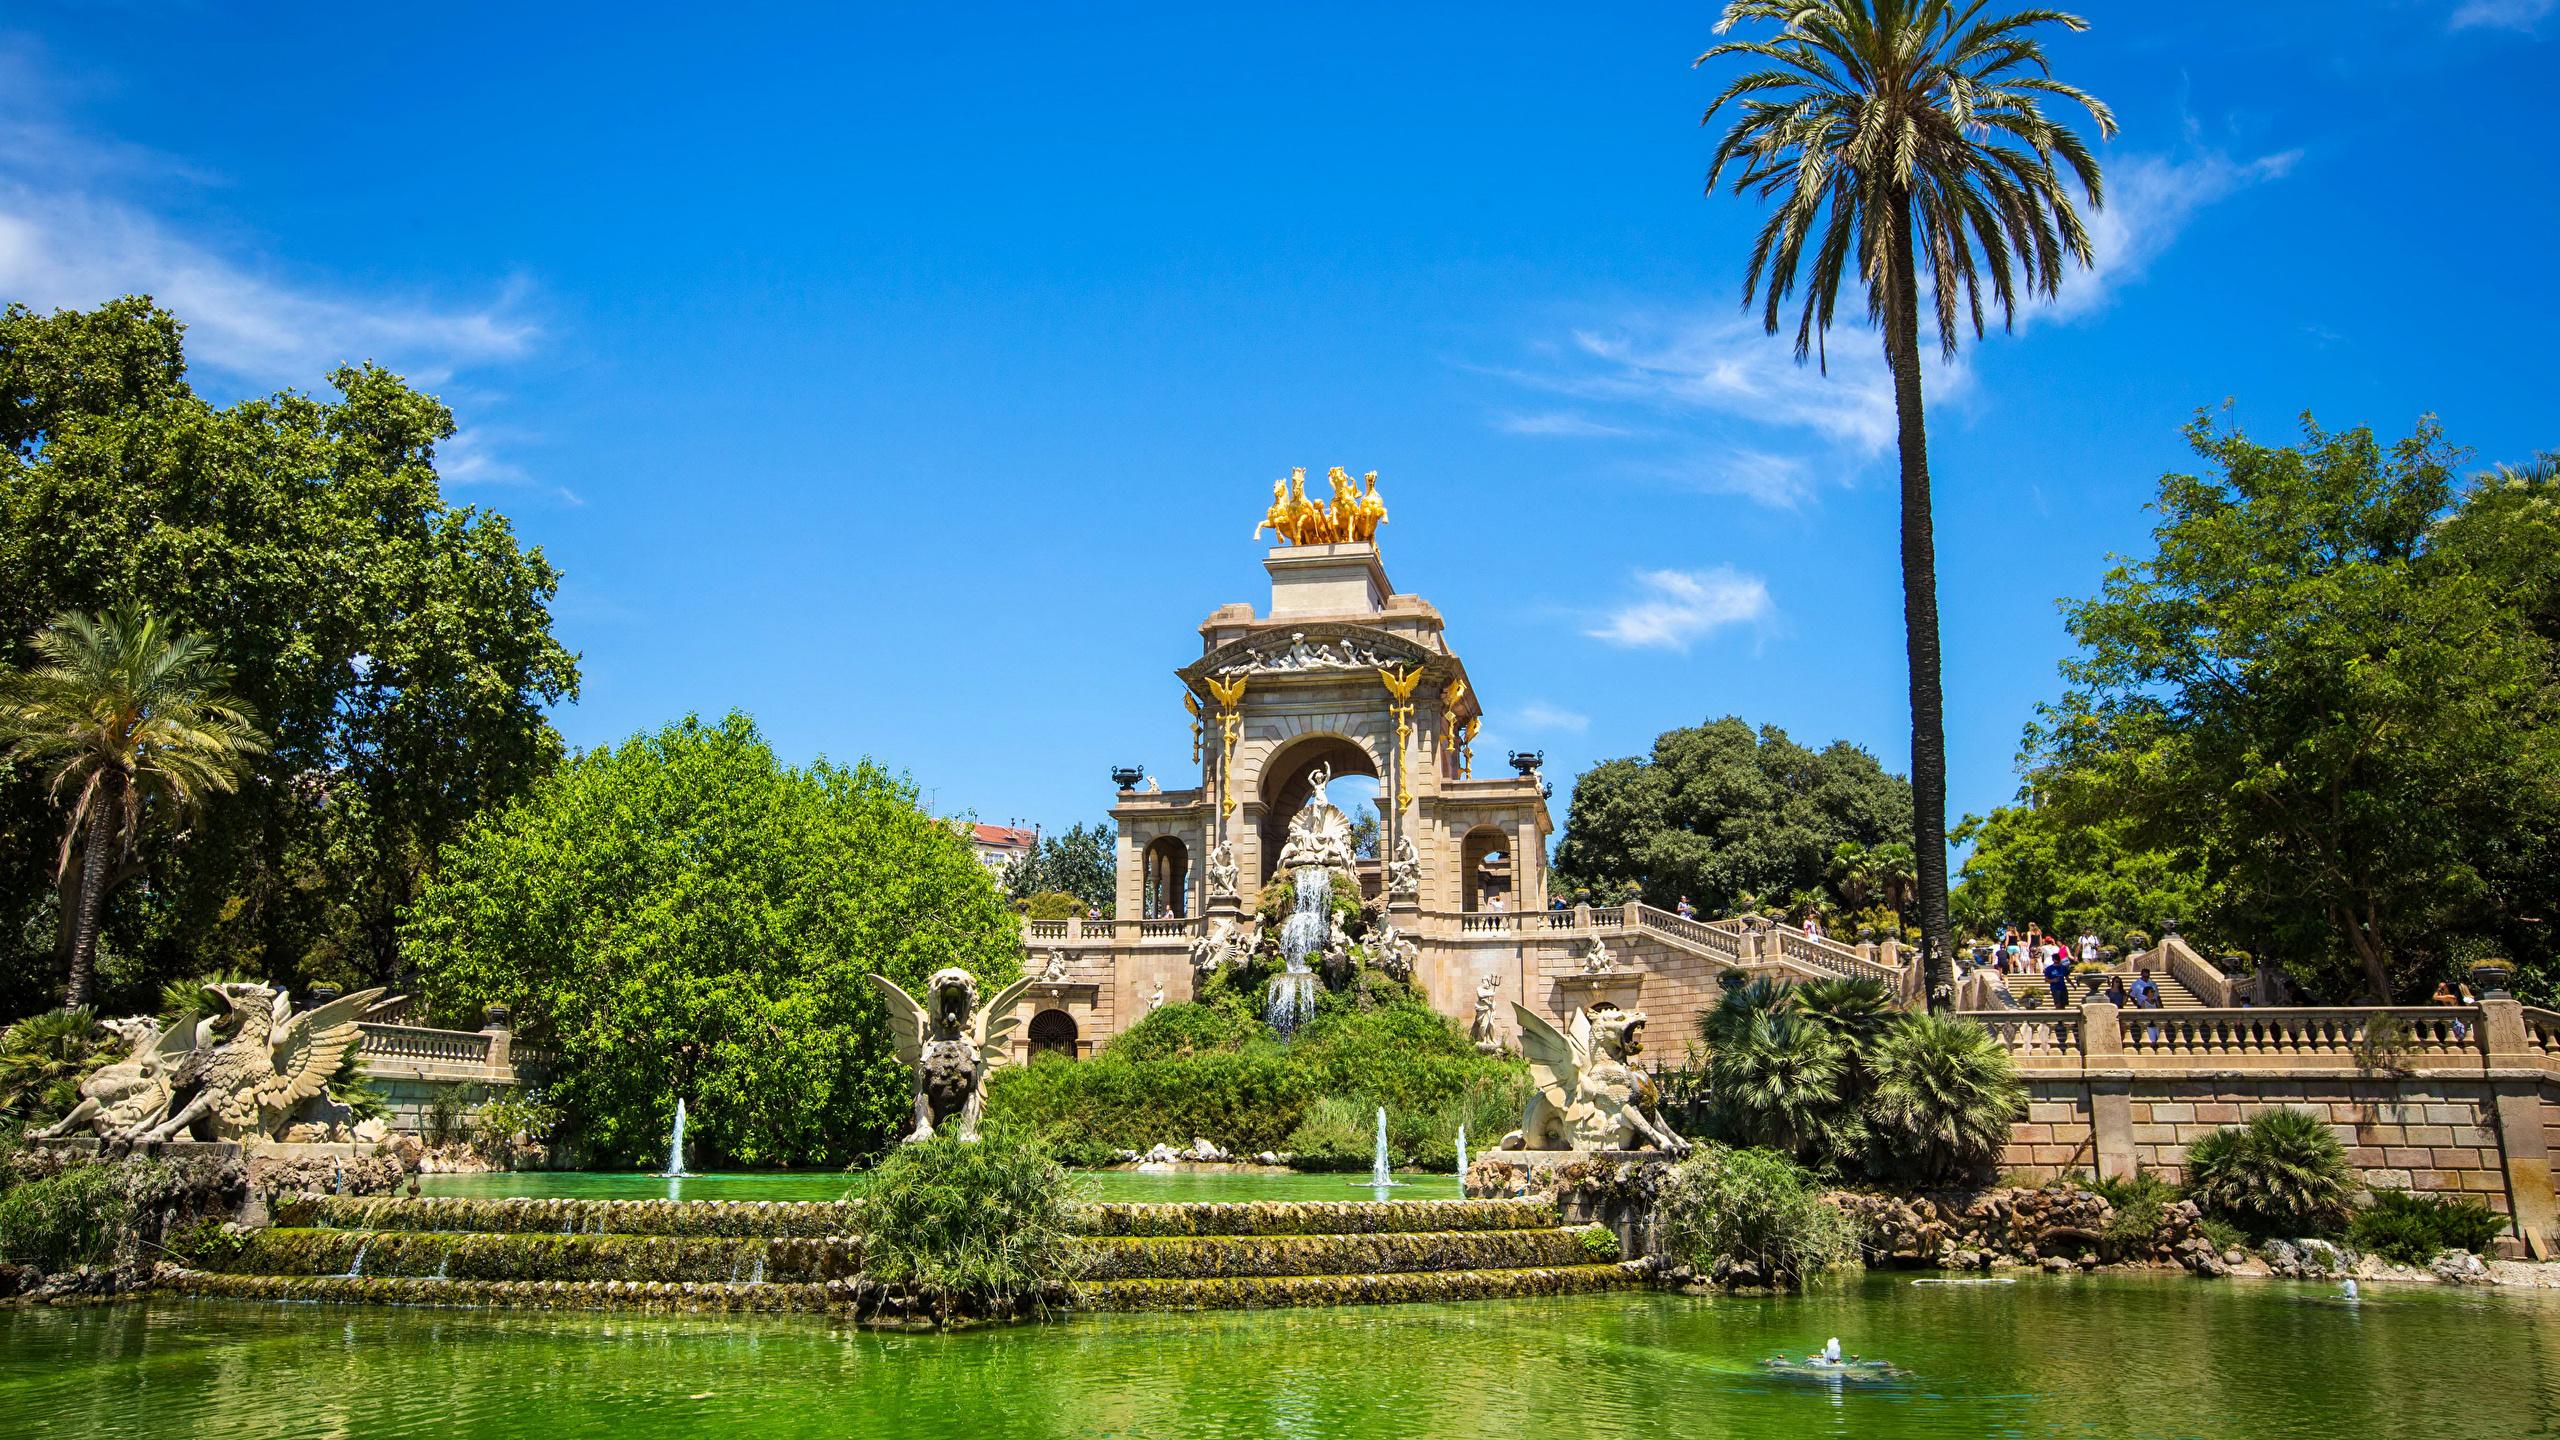 Fonds Decran 2560x1440 Espagne Parc Sculptures étang